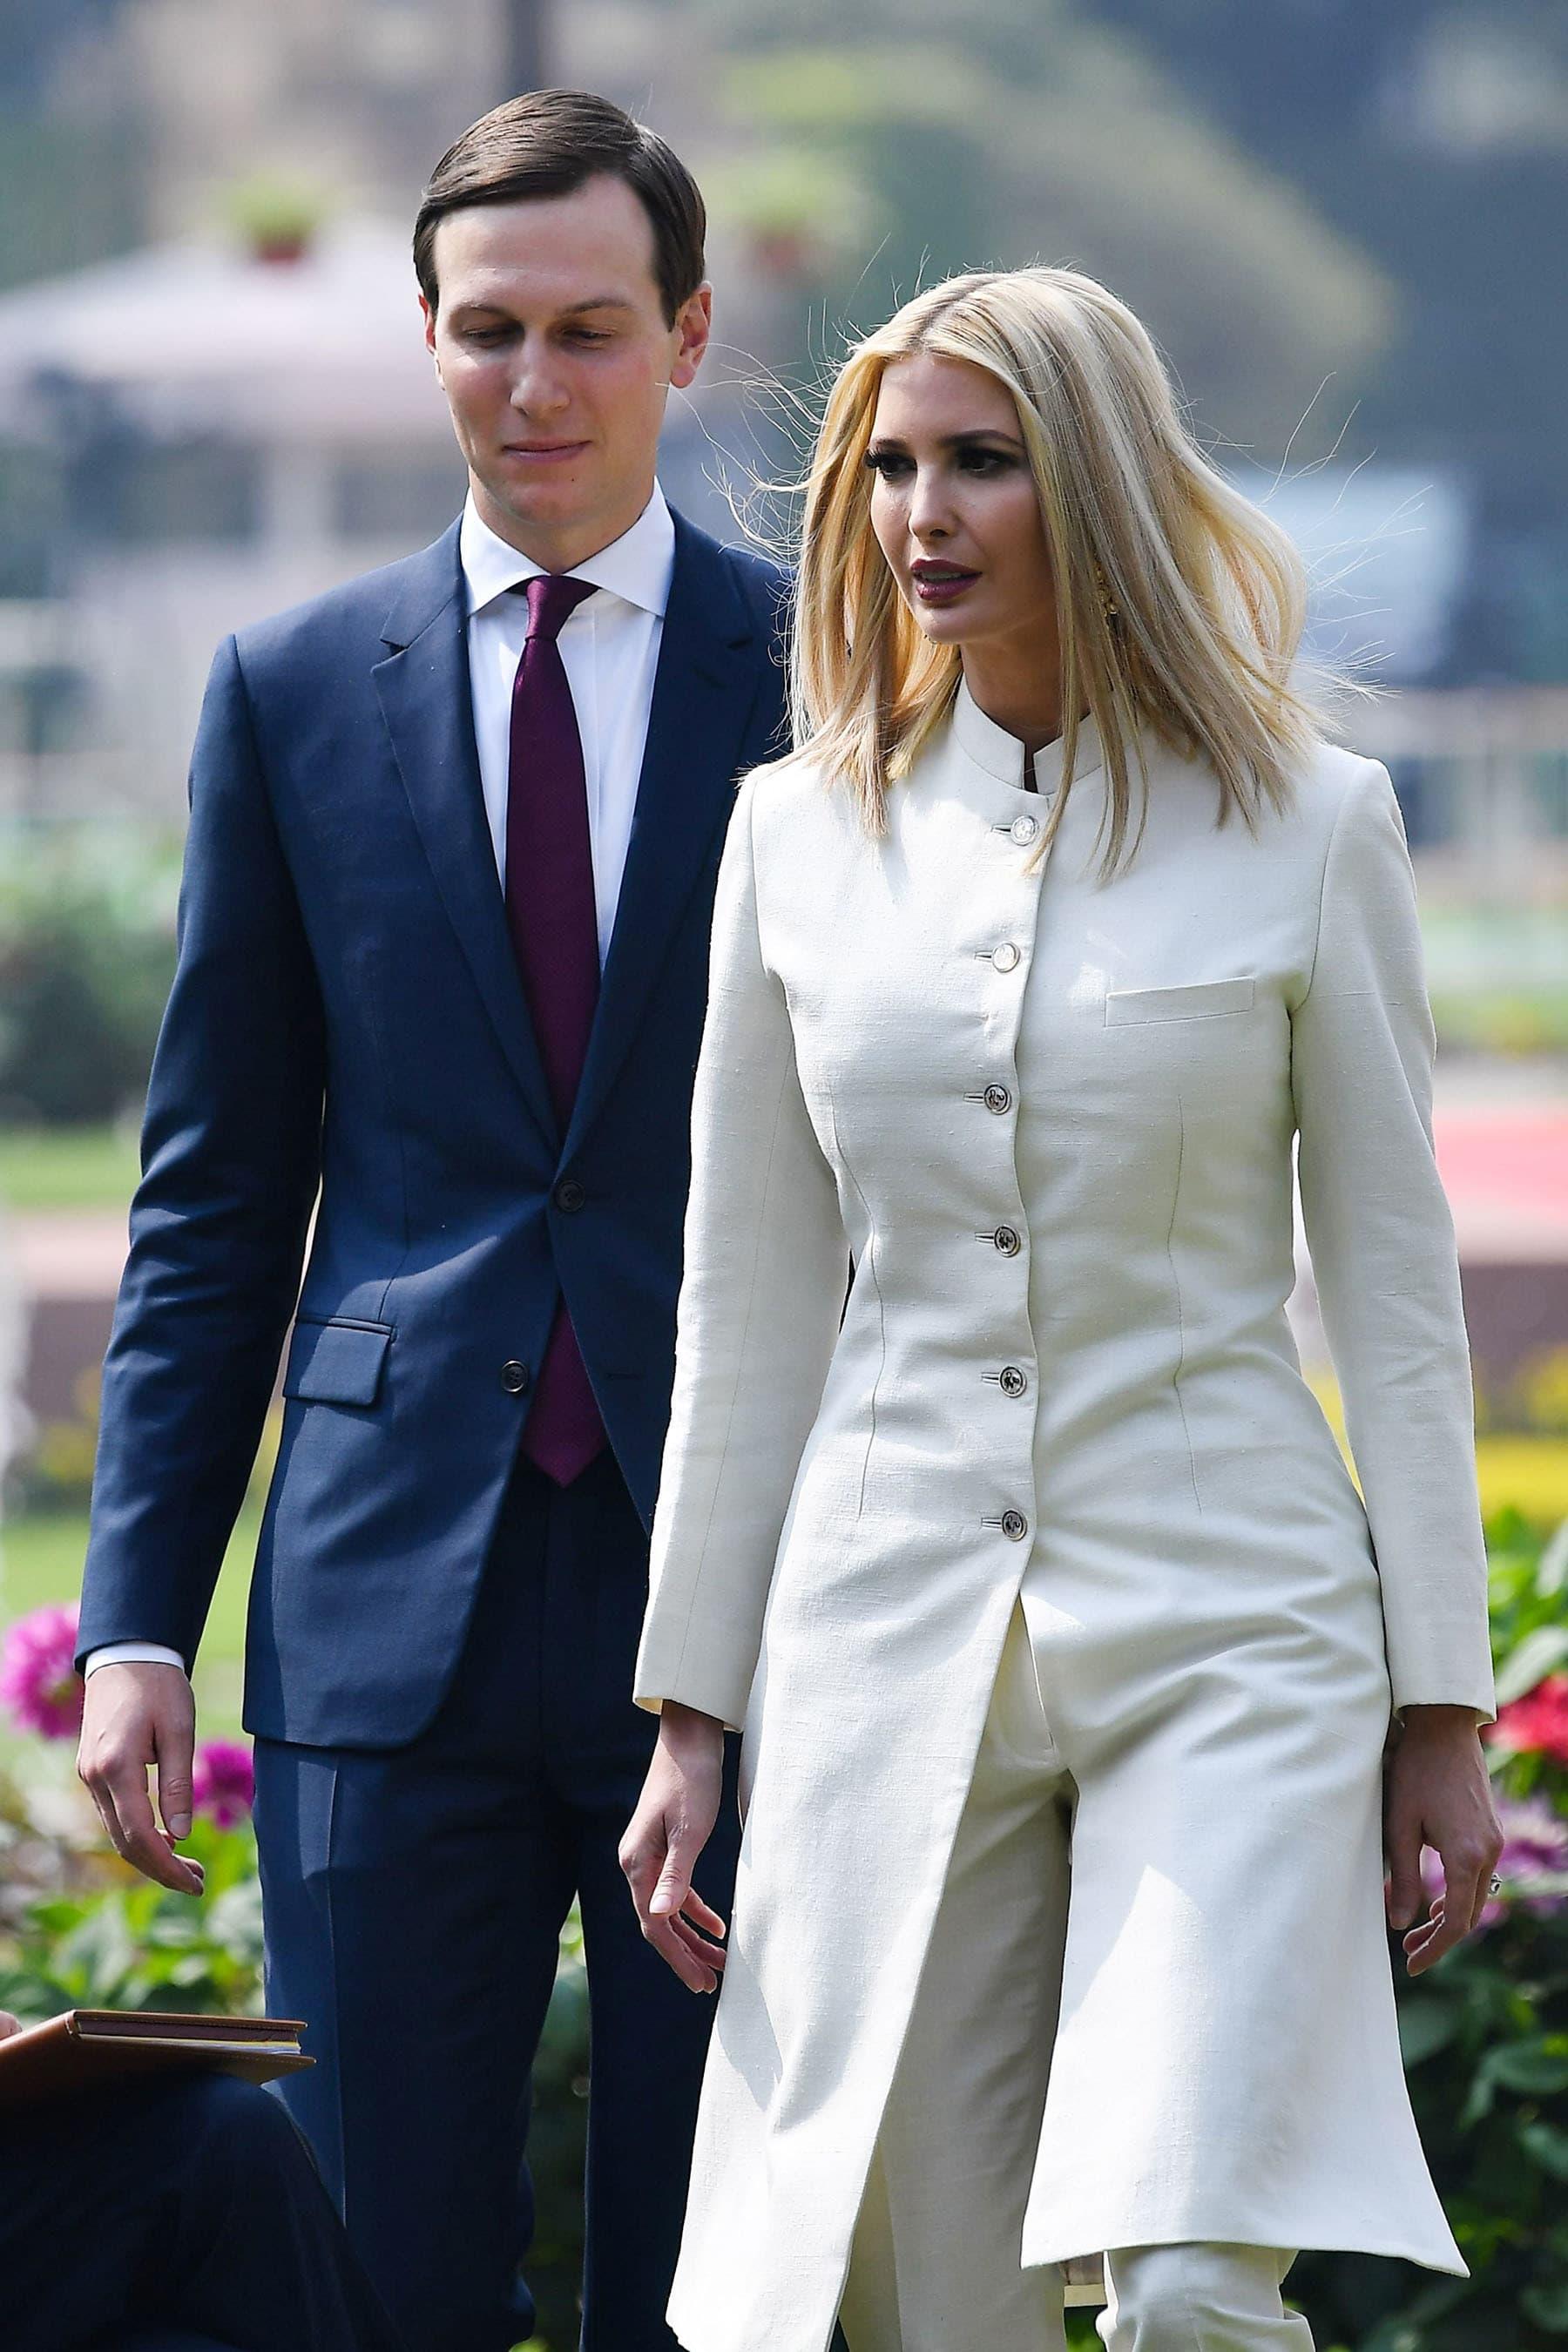 White House senior advisors Ivanka Trump and Jared Kushner arrive at Hyderabad House in New Delhi on Feb 25. — AFP